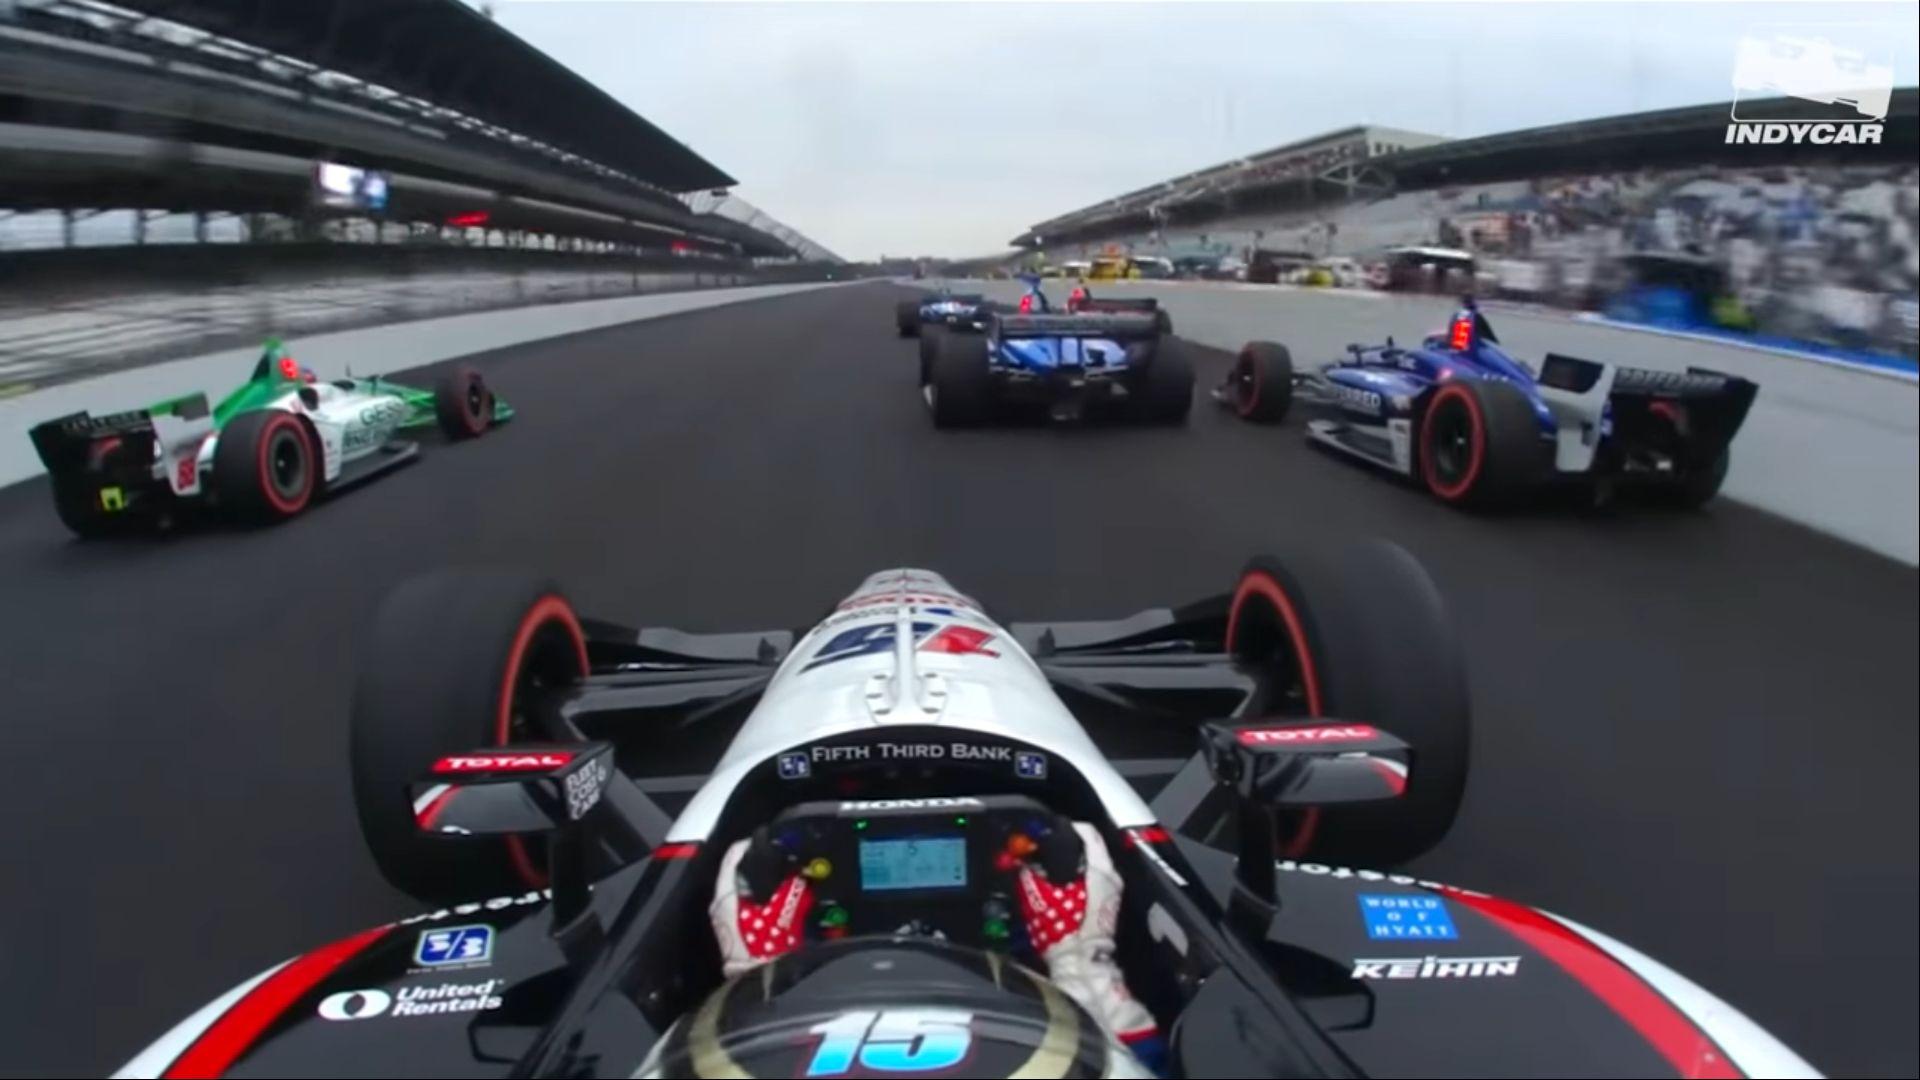 Онборд старта Гран-при Индианаполиса